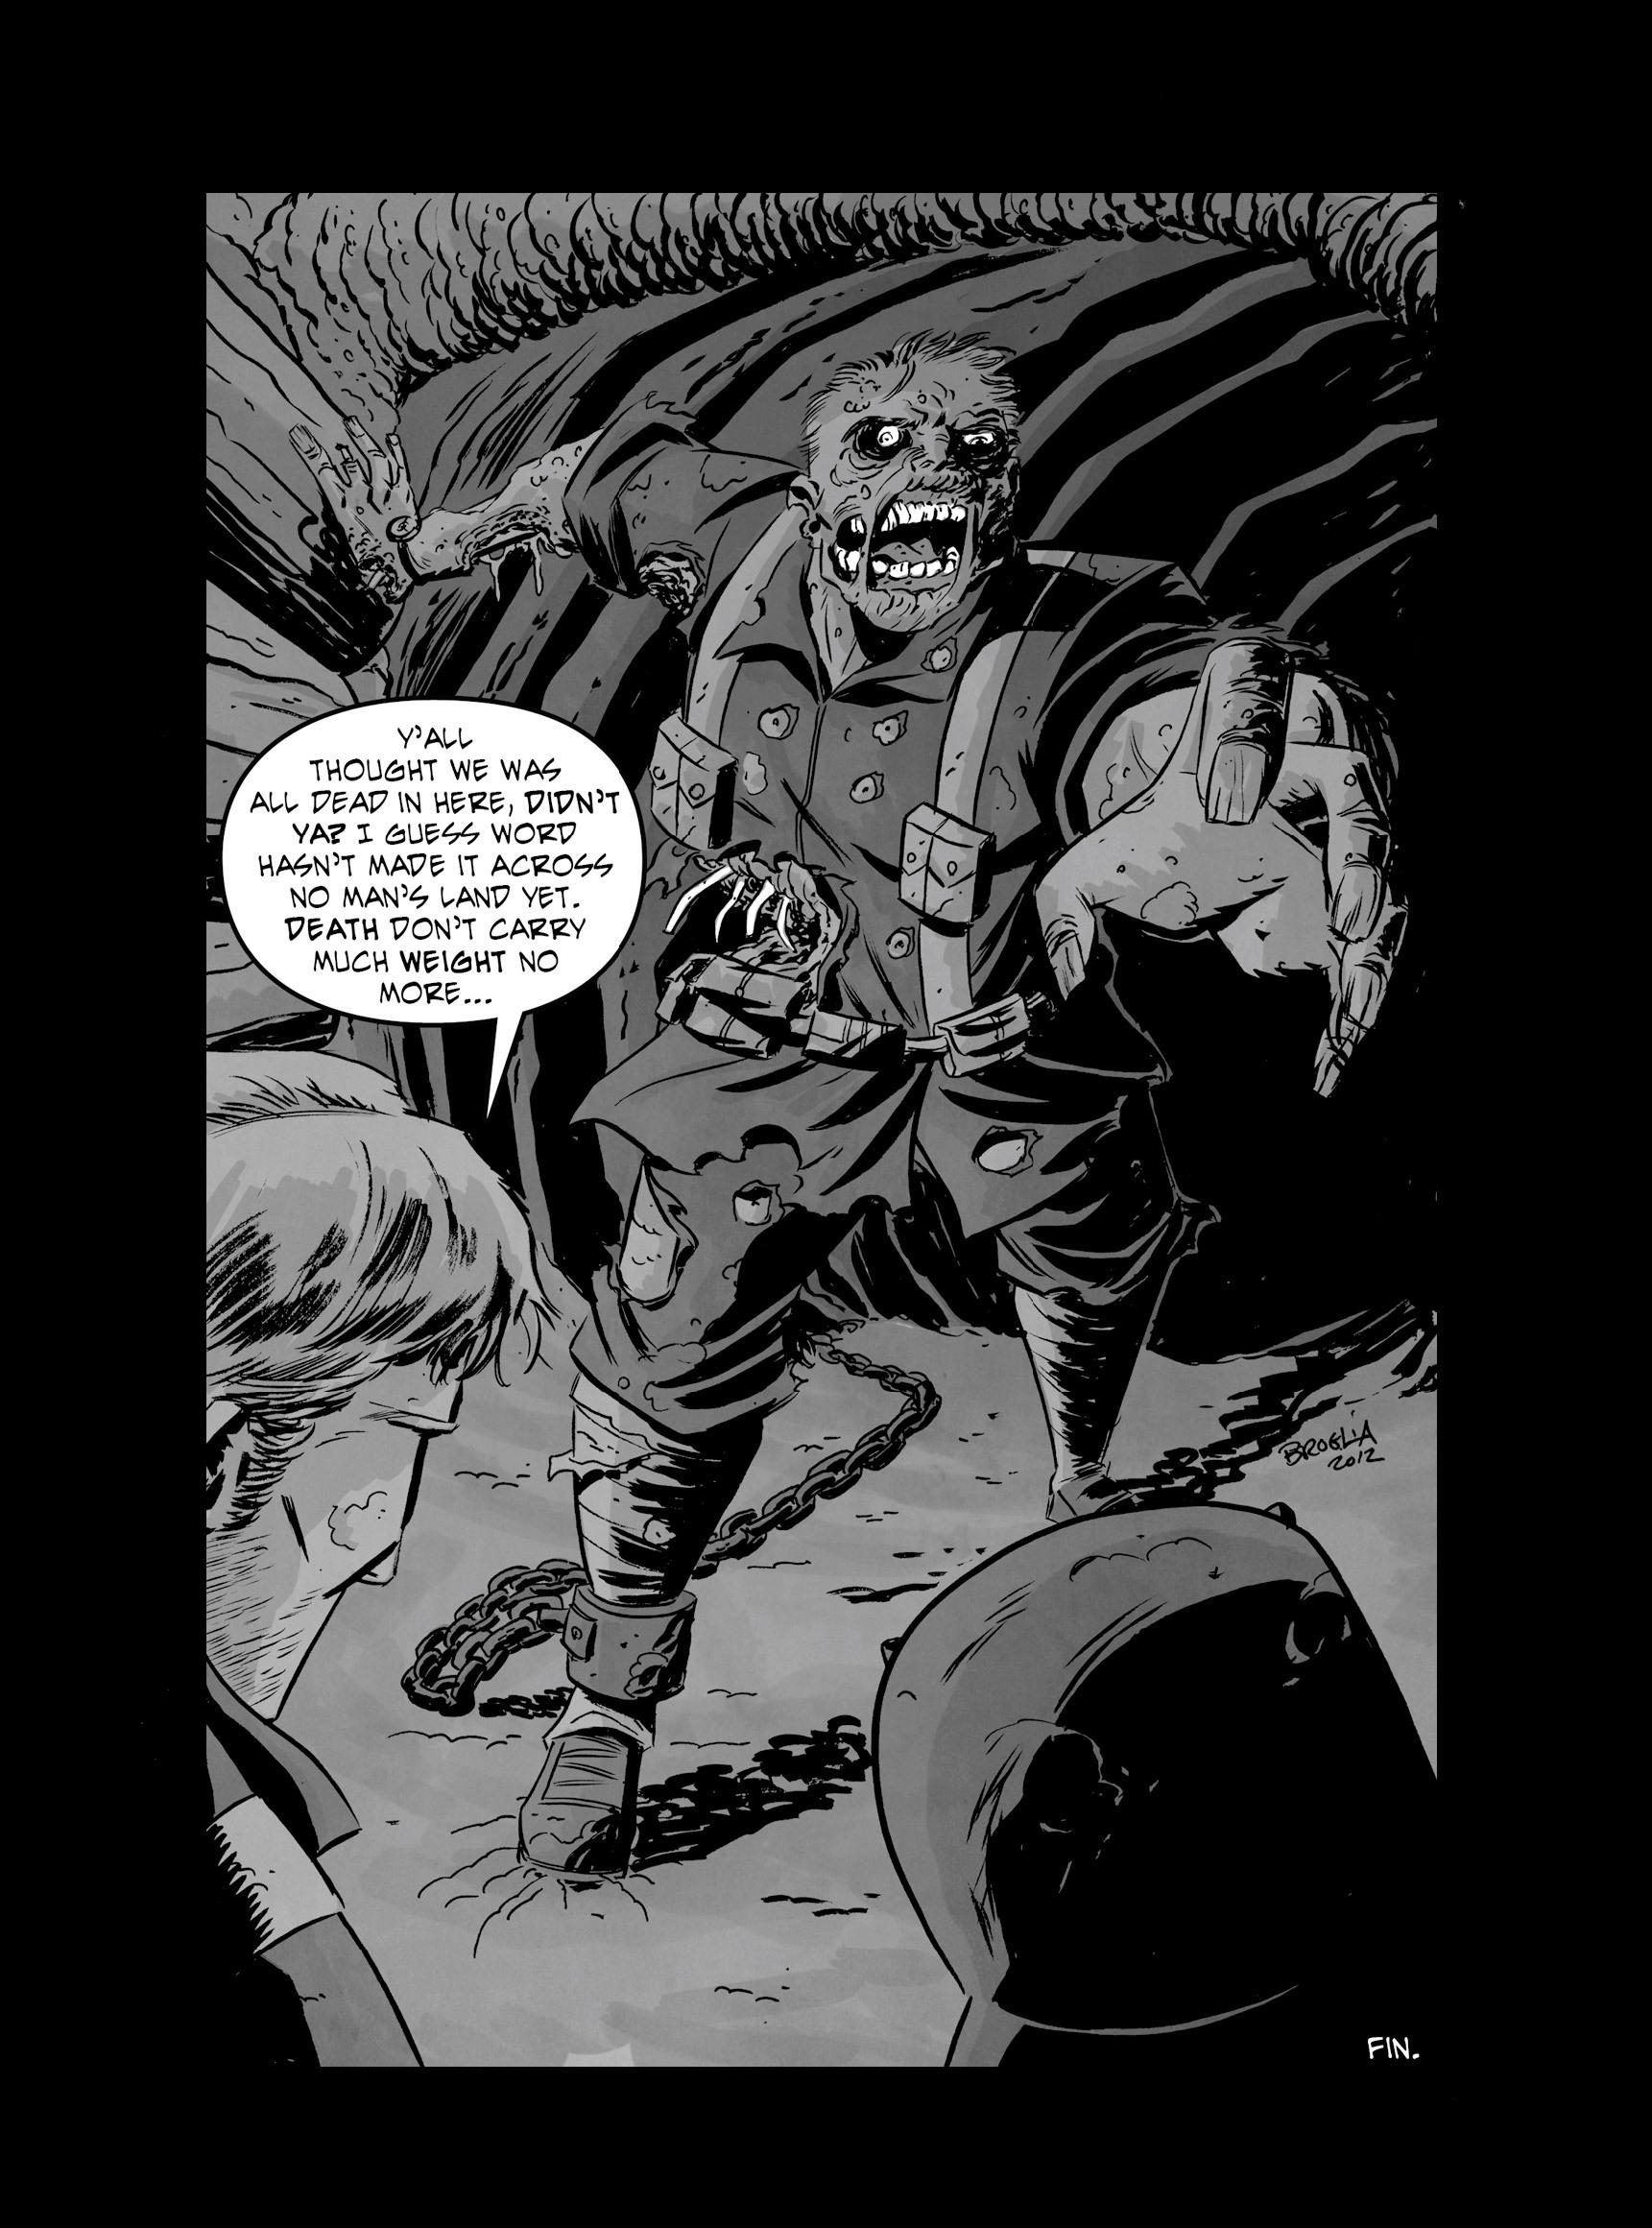 Read online FUBAR comic -  Issue #3 - 232